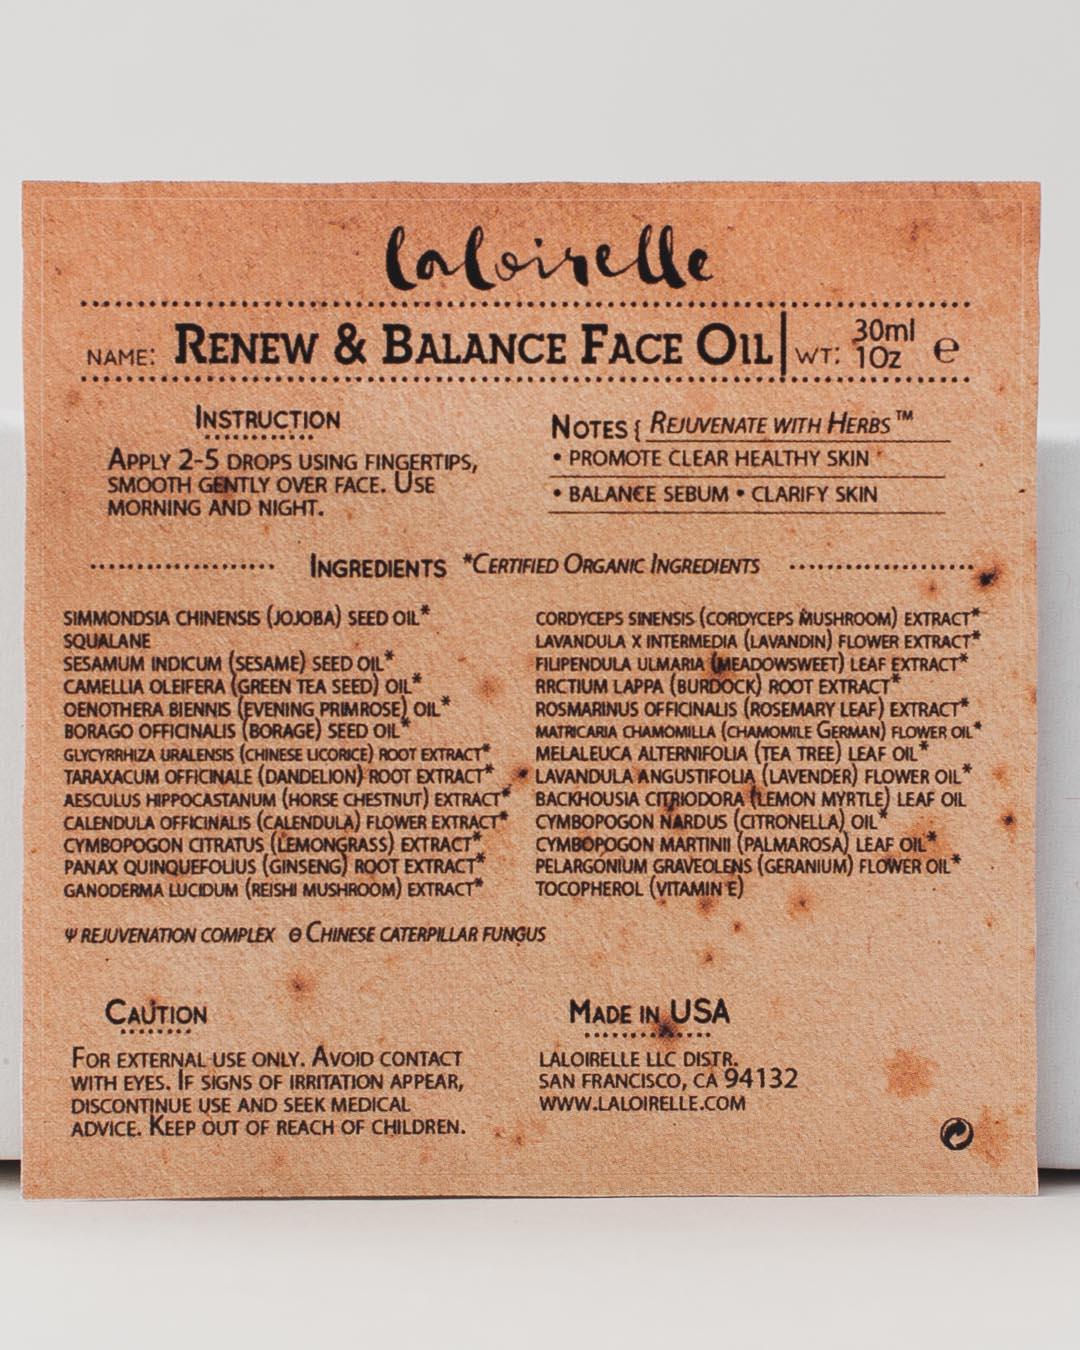 Renew and Balance Face Oil – Laloirelle 03